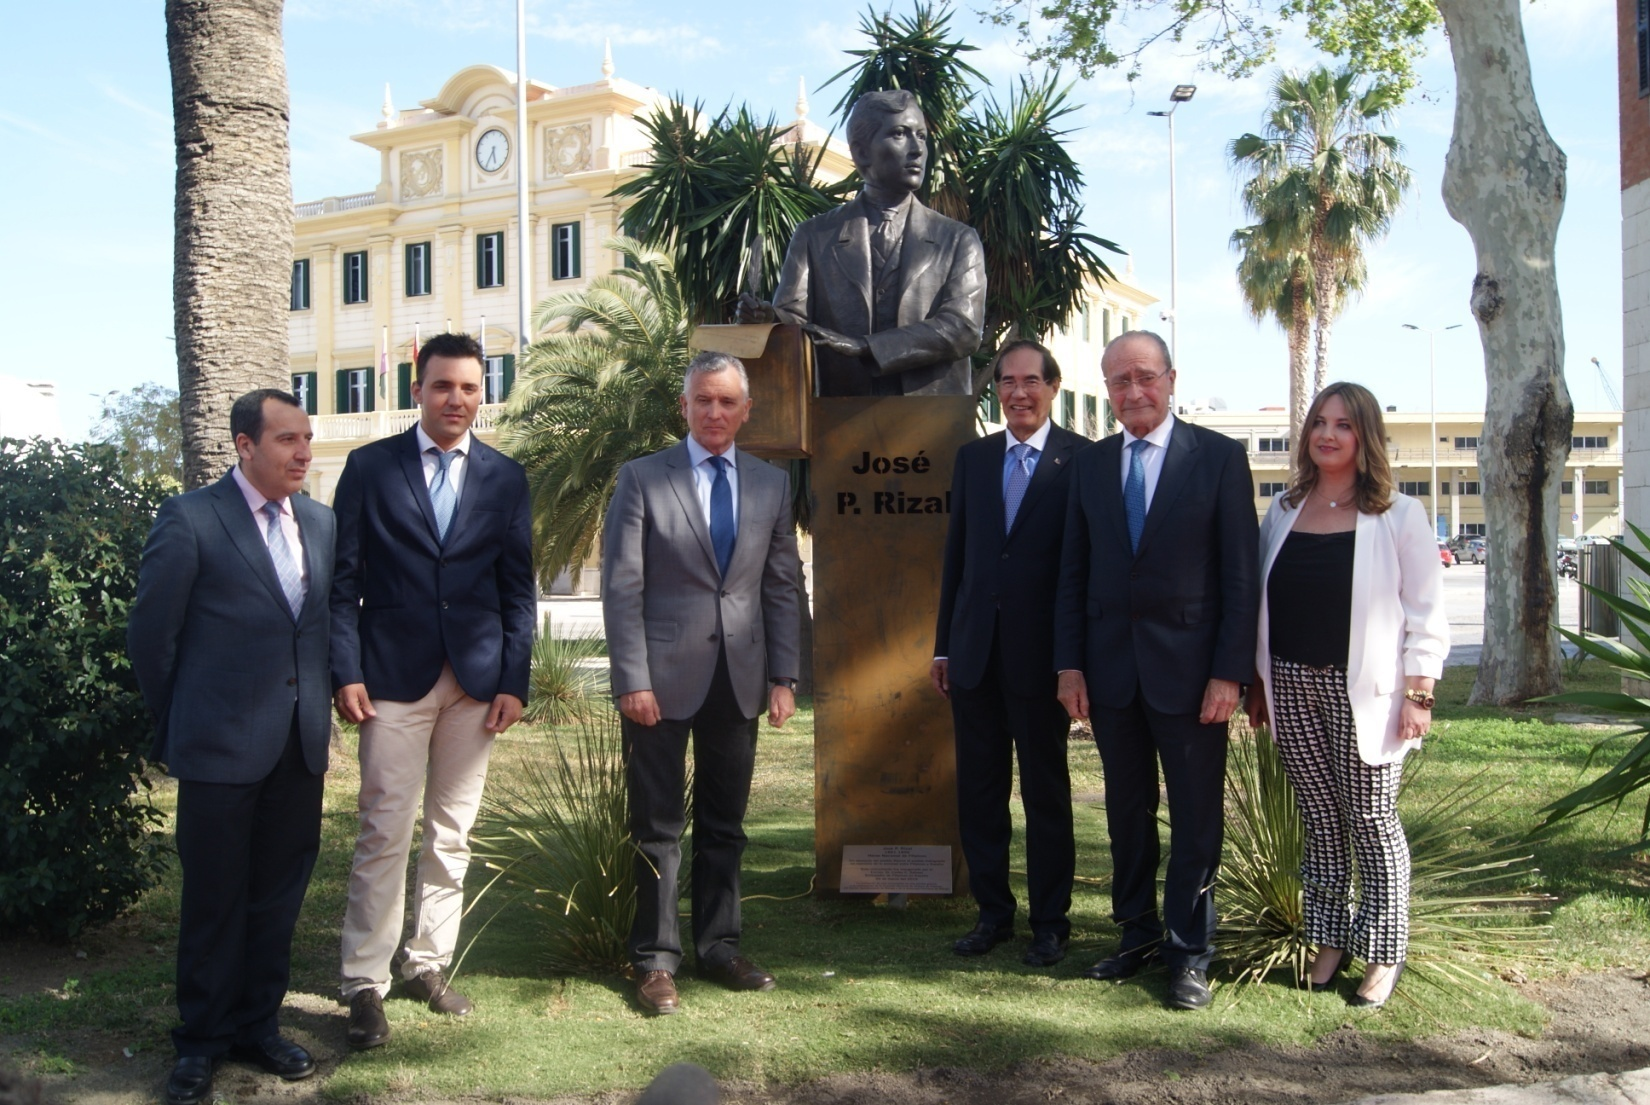 L-R: Mr. José Luis Ruíz Espejo, Mr. Juan Vega, Mr. Paulino Plata Cánovas, Ambassador Salinas, Mayor Francisco de la Torre Prados, and Consul Rosa Agüera